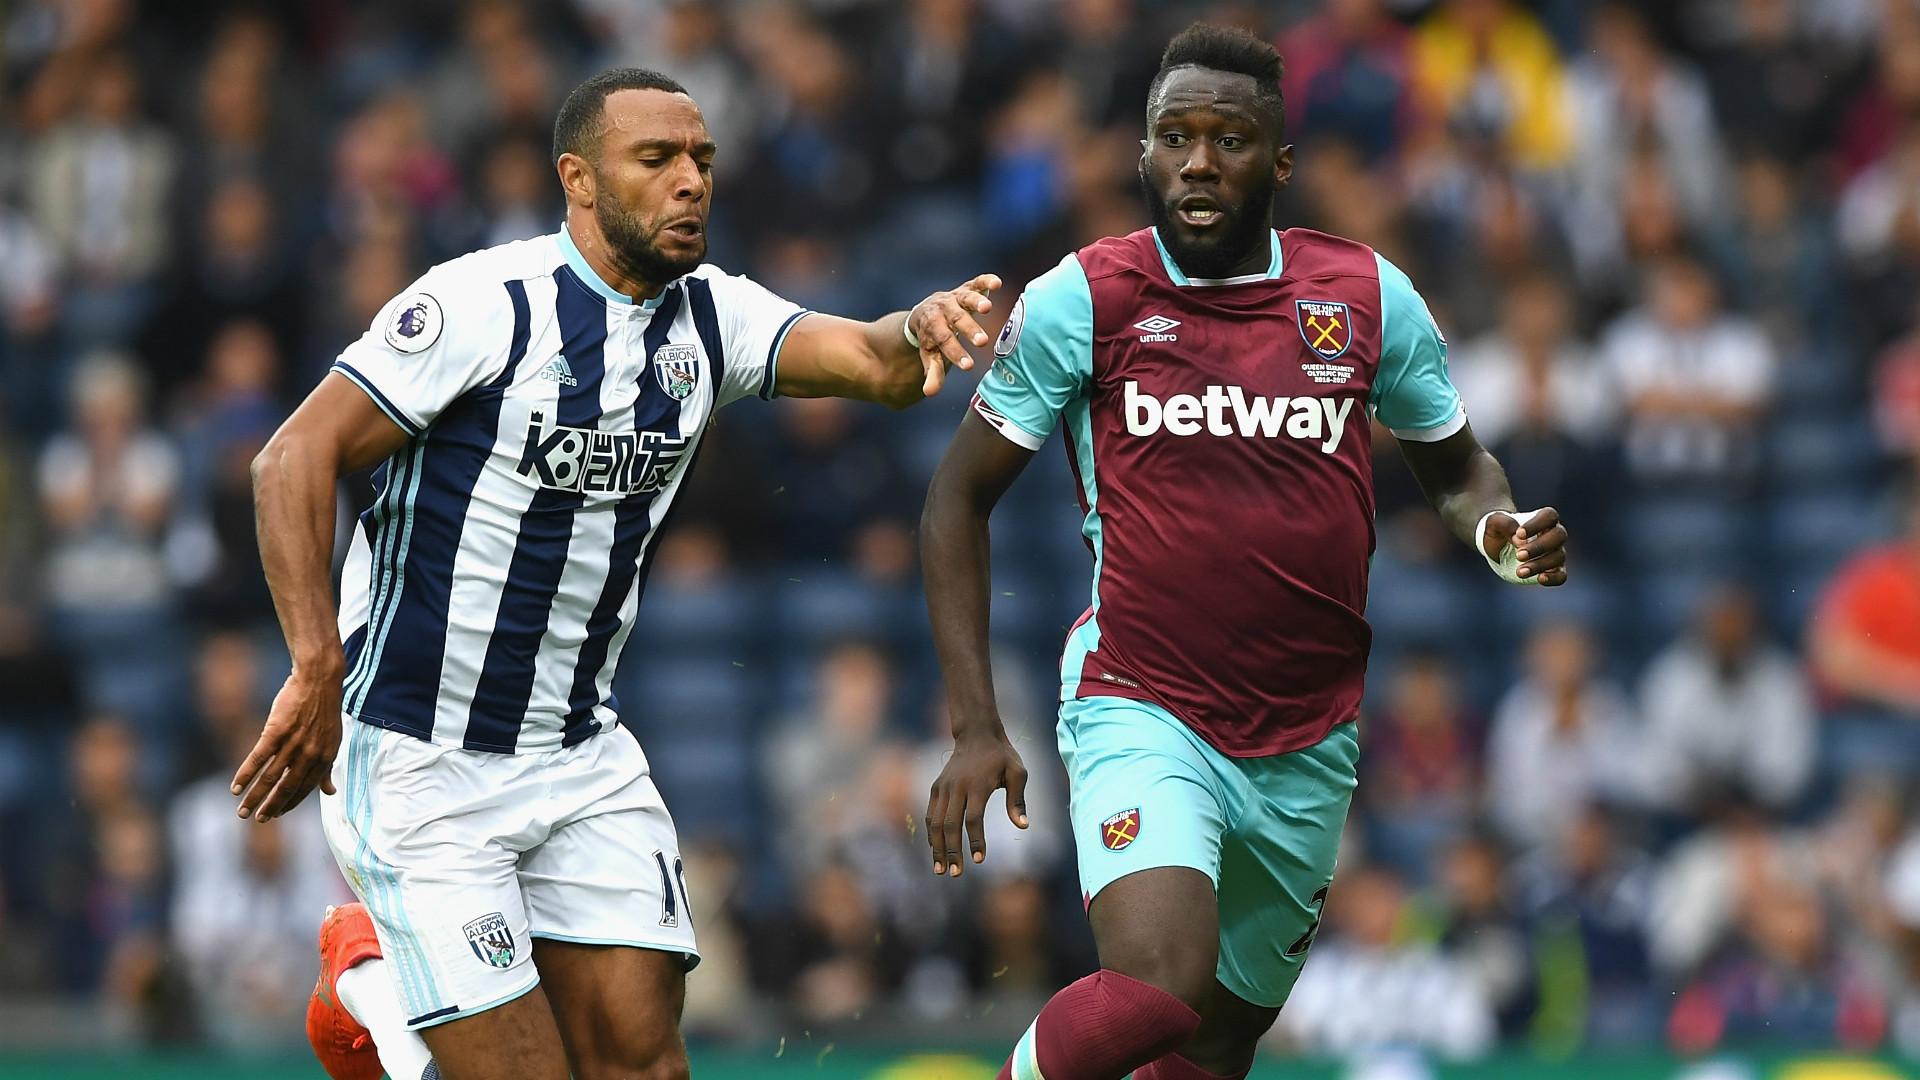 West Ham United's Arthur Masuaku refutes transfer speculations